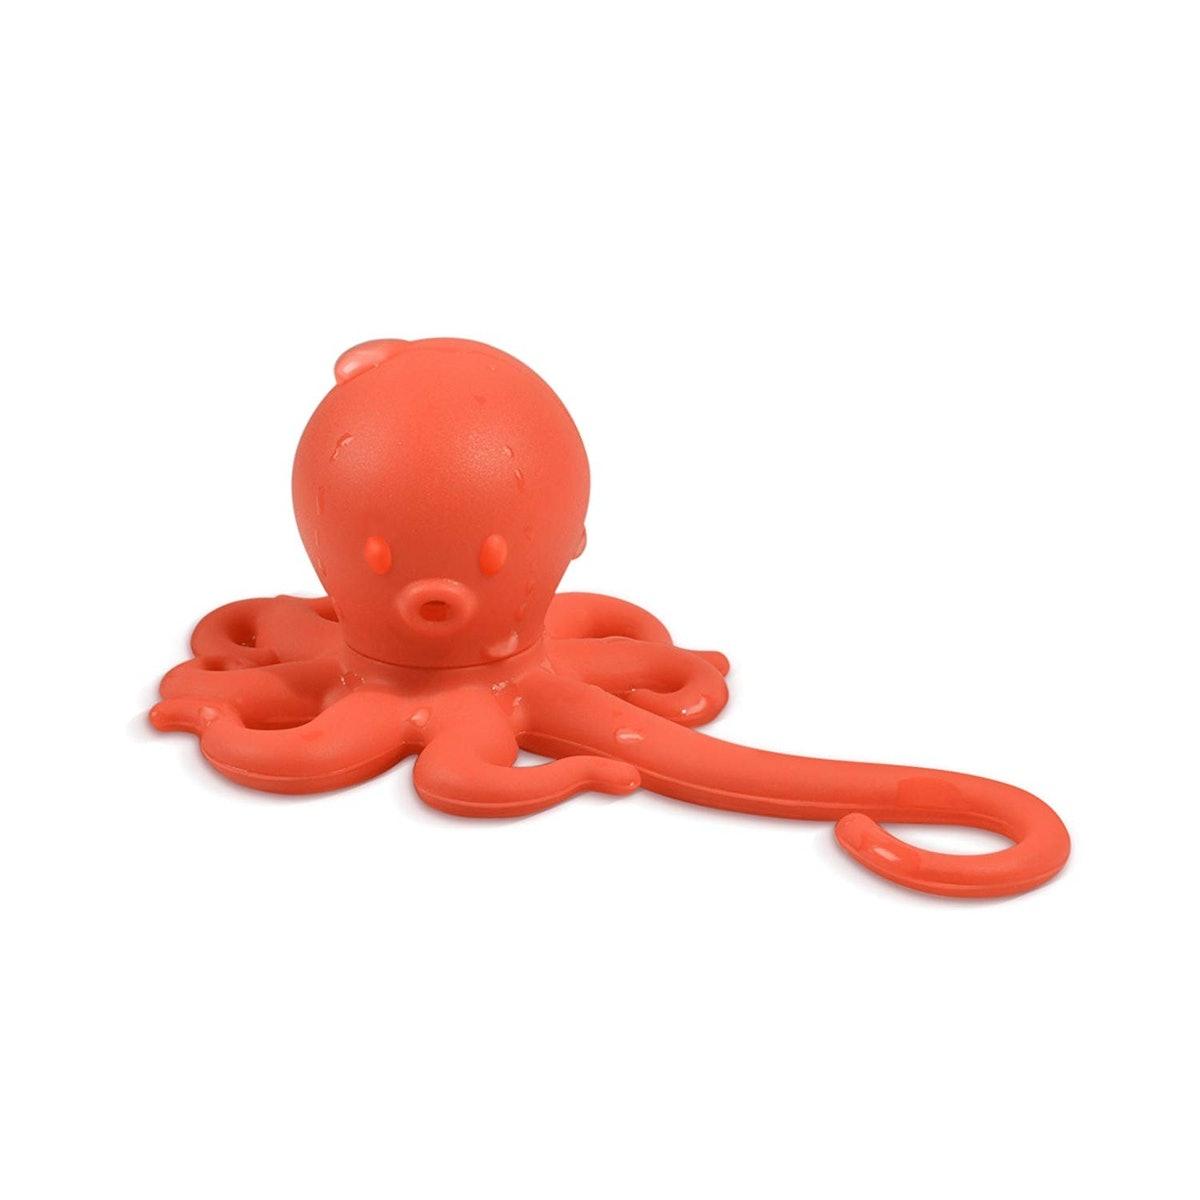 Fred & Friends Octopus Tea Infuser